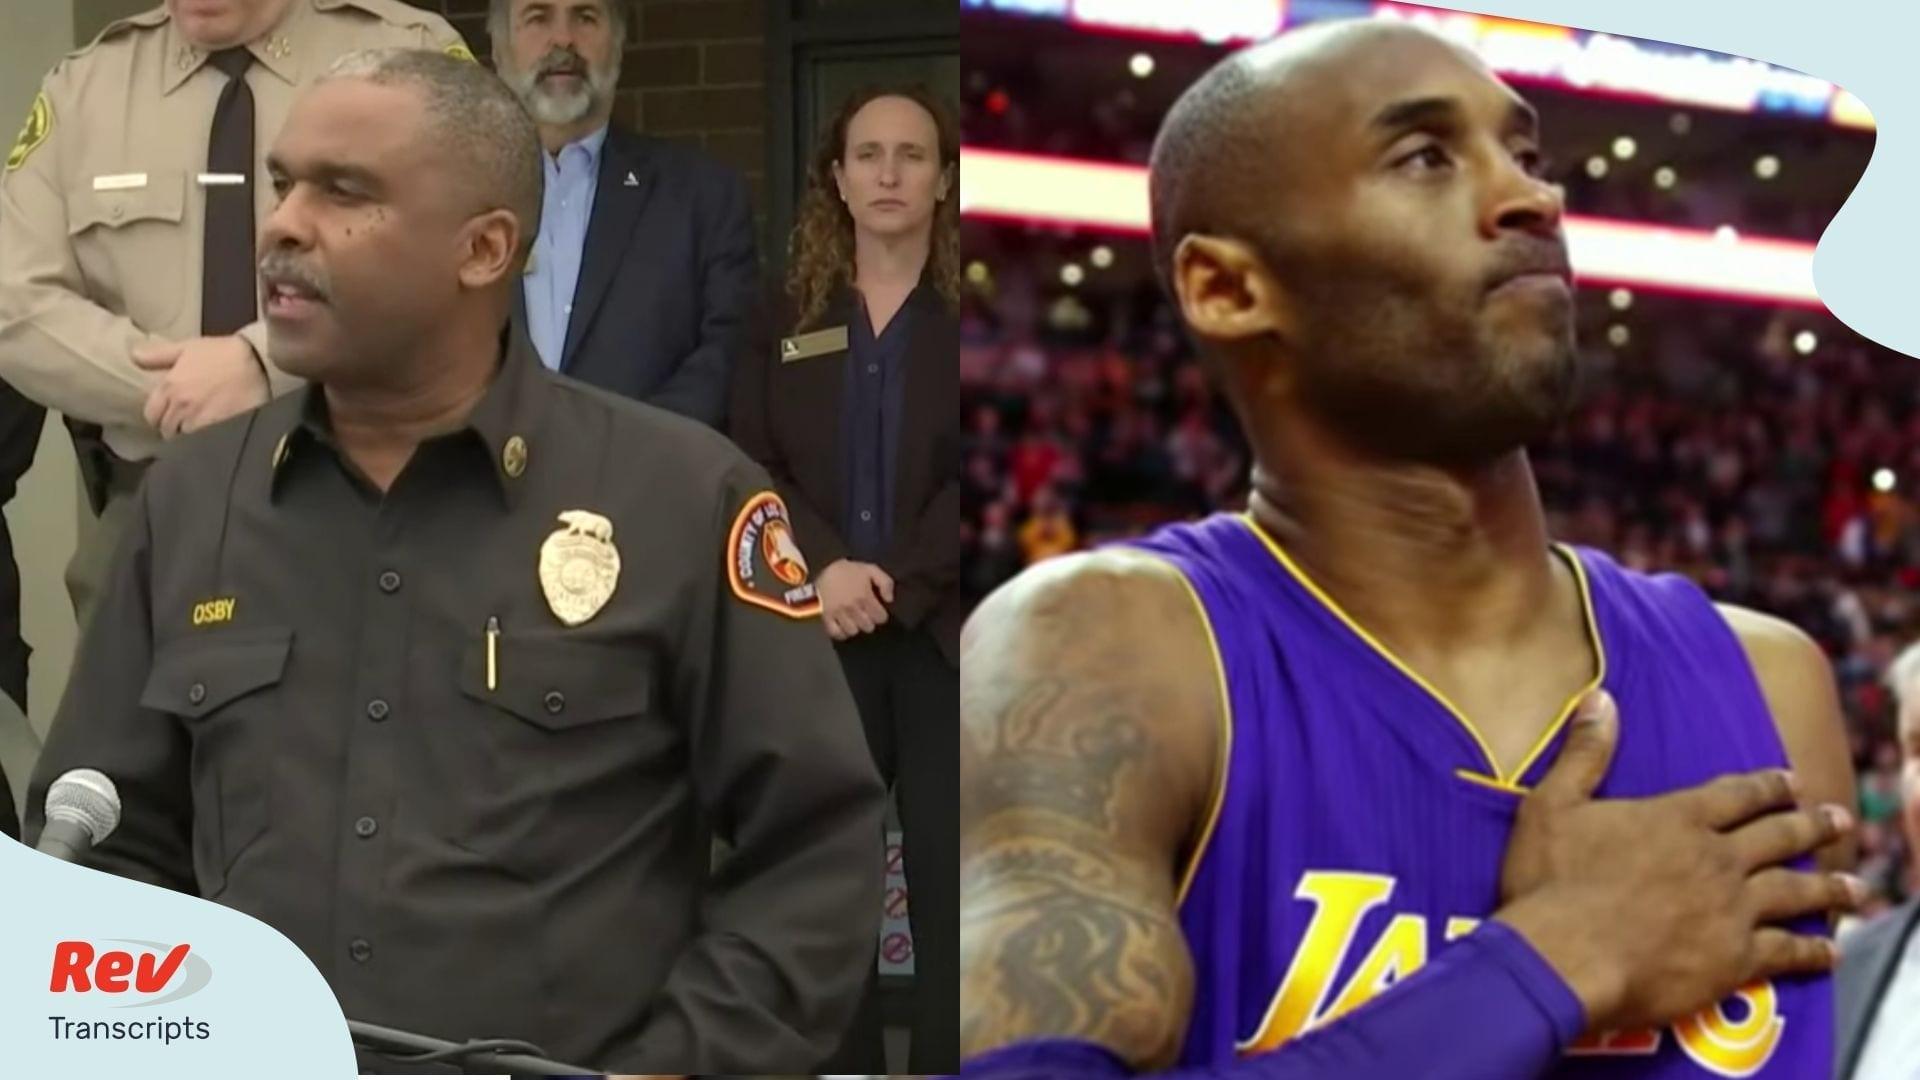 Transcript Los Angeles Officials Public Address Kobe Bryant Death